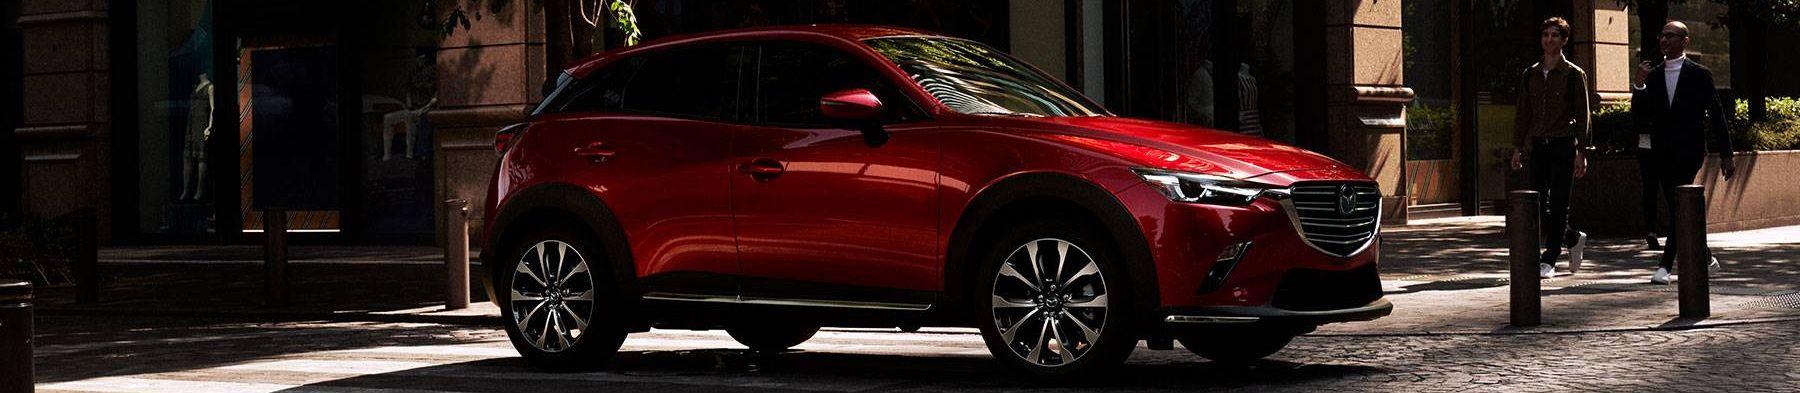 2019 Mazda CX-3 Financing in Waco, TX